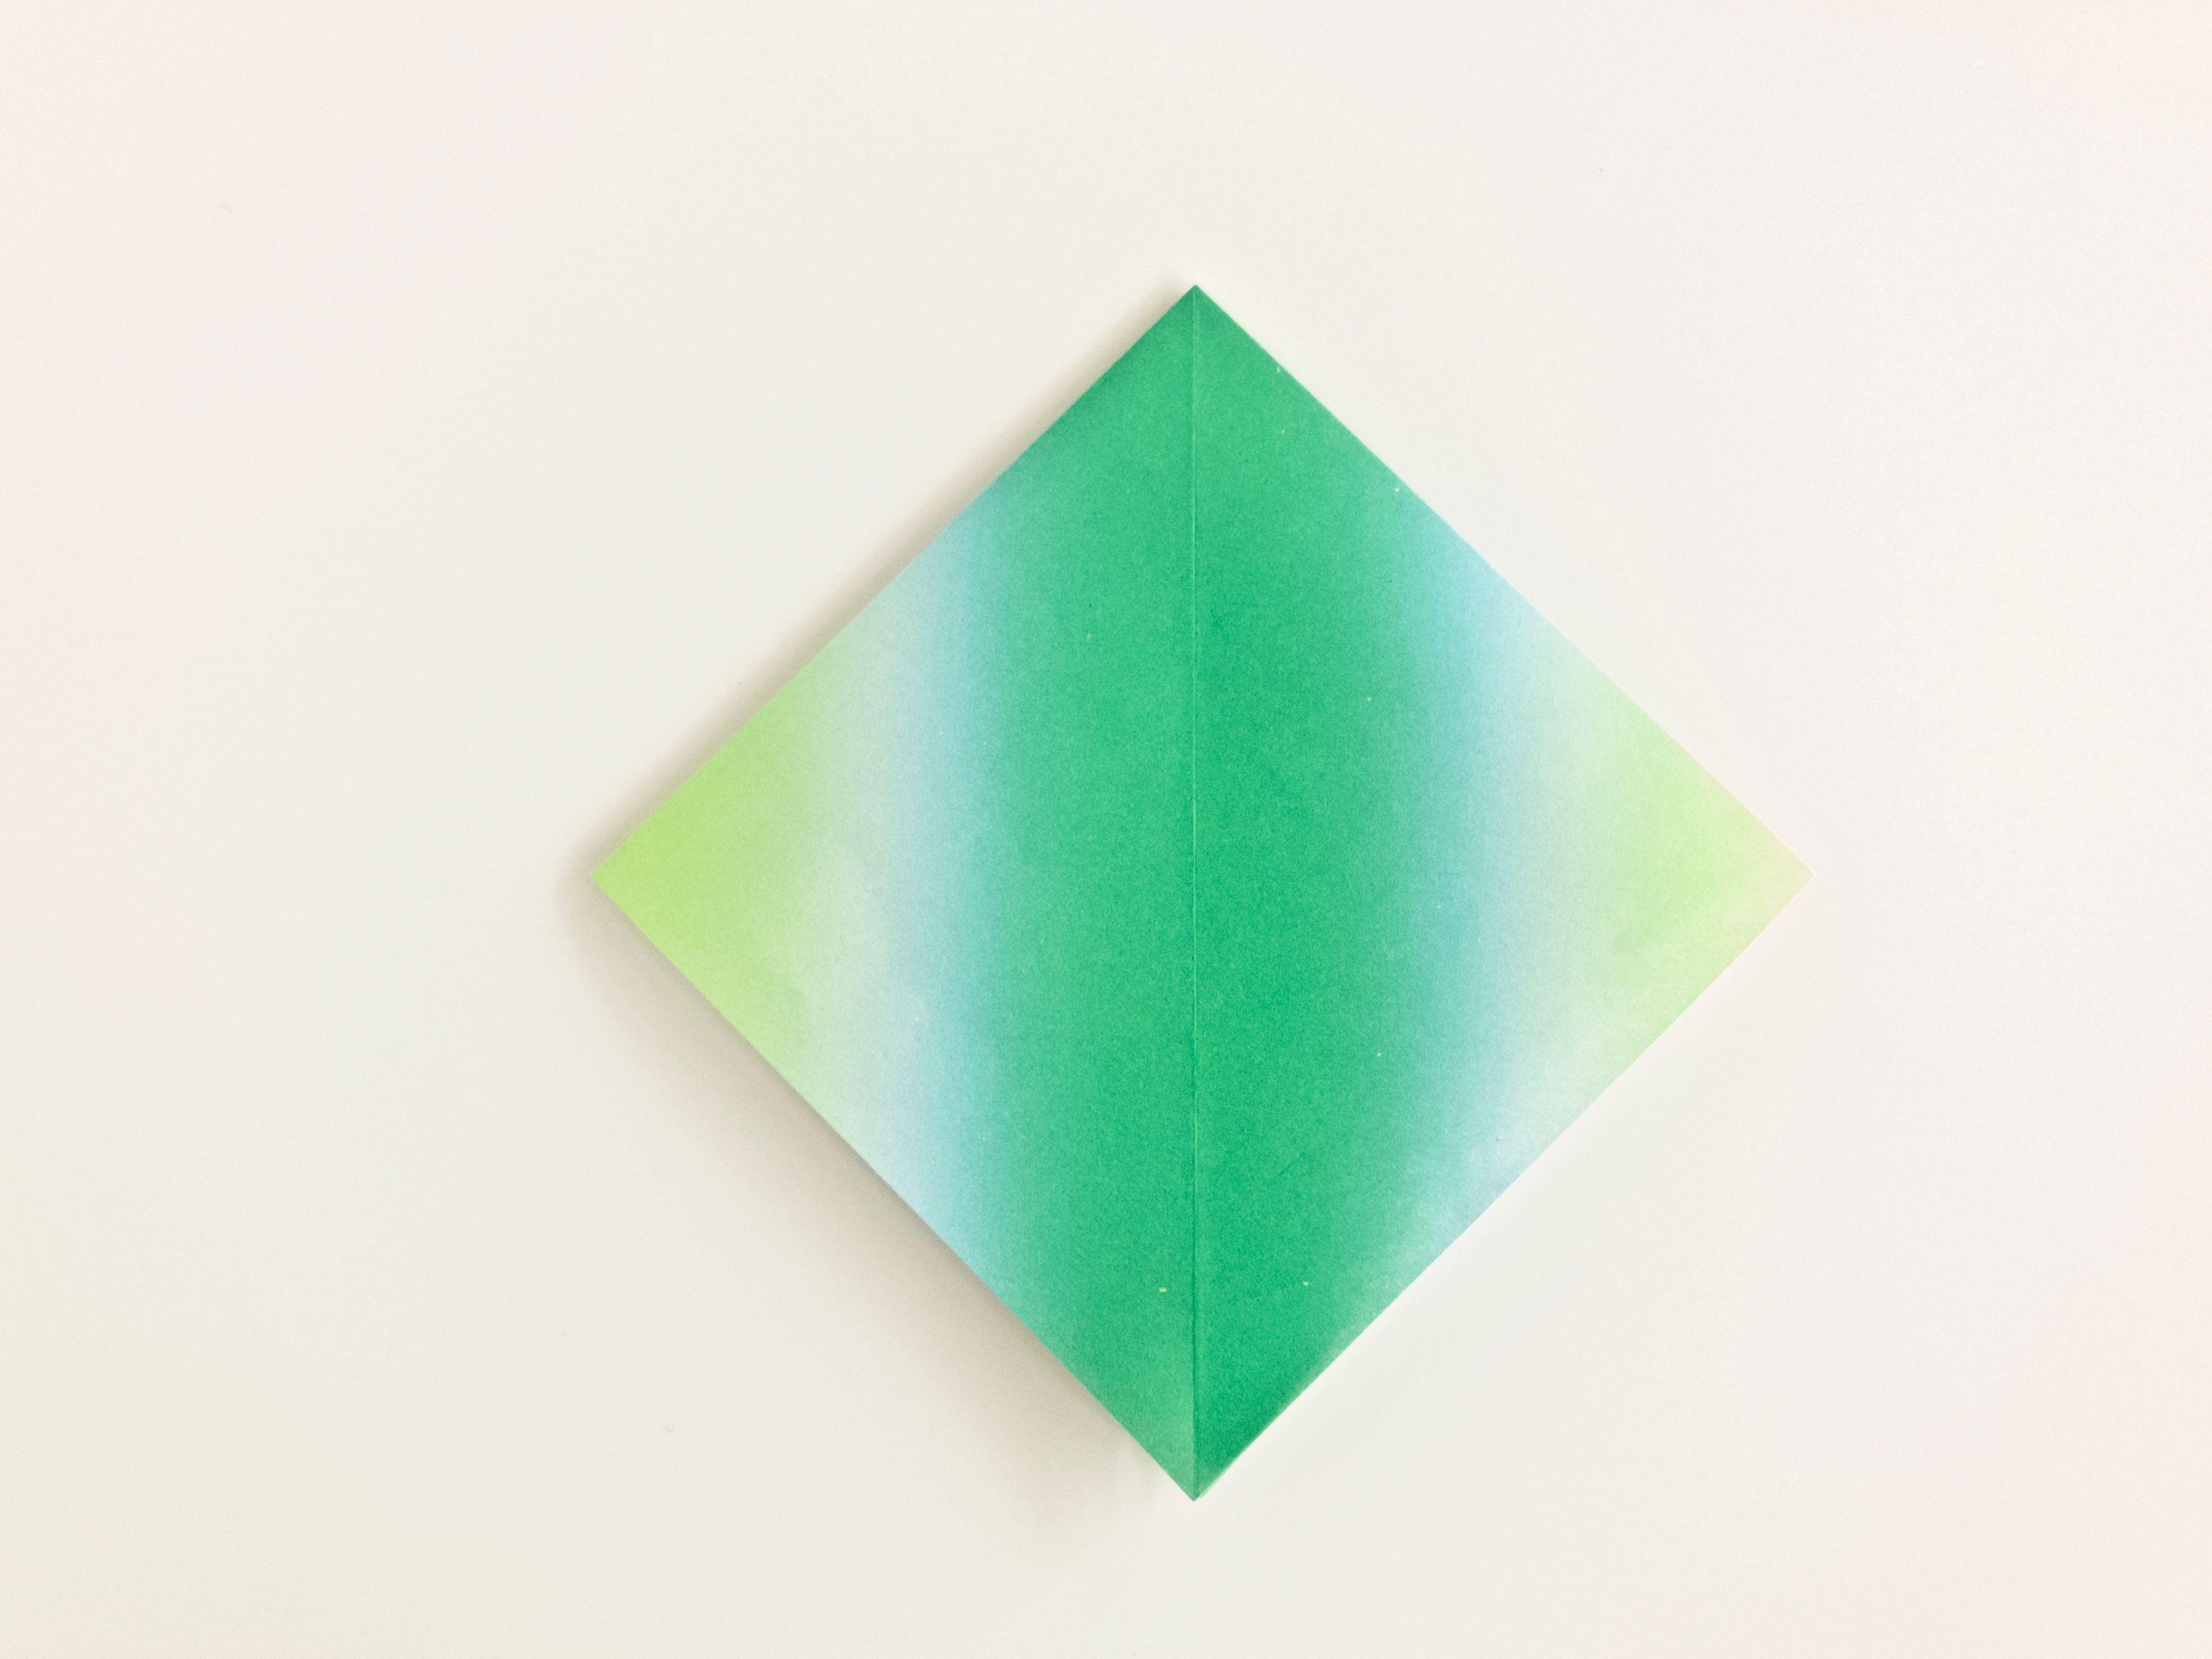 Origami Crane Images, Stock Photos & Vectors | Shutterstock | 2888x3851